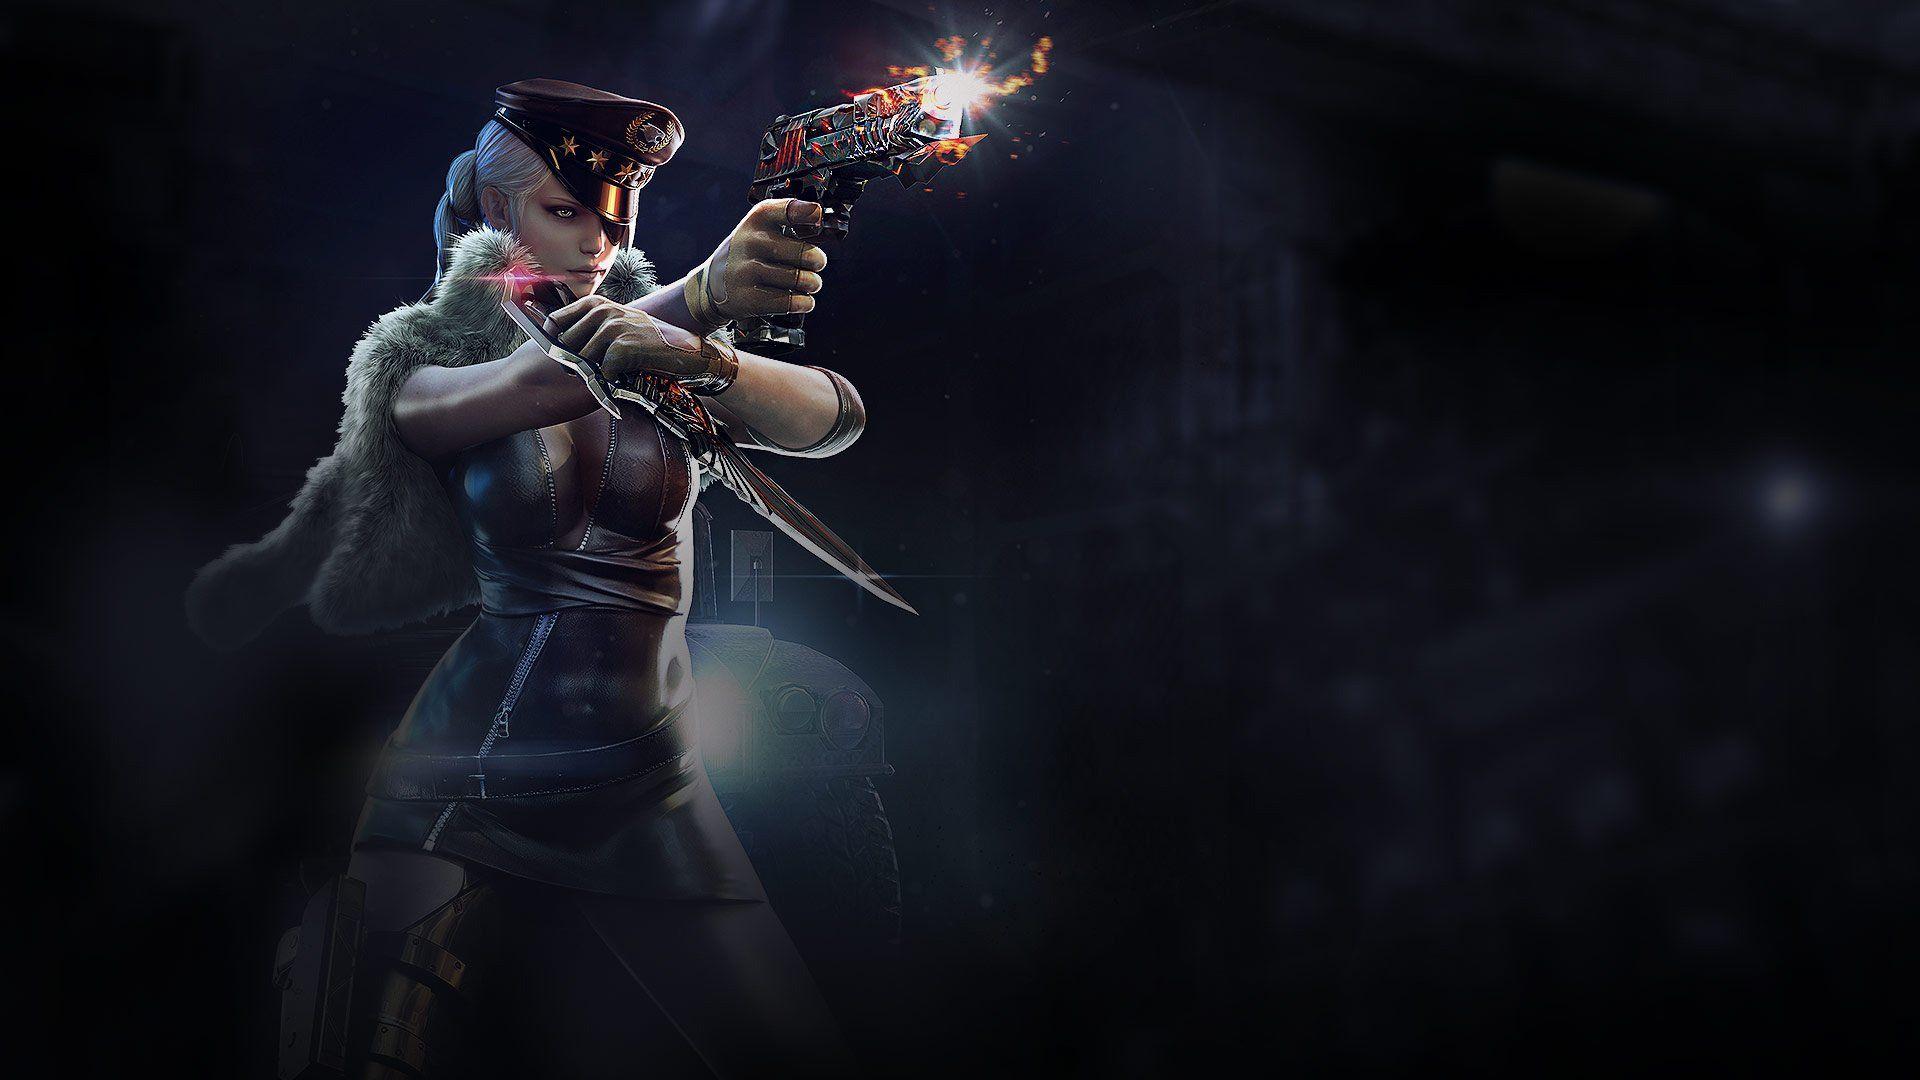 Video Game Crossfire Wallpaper Crossfire